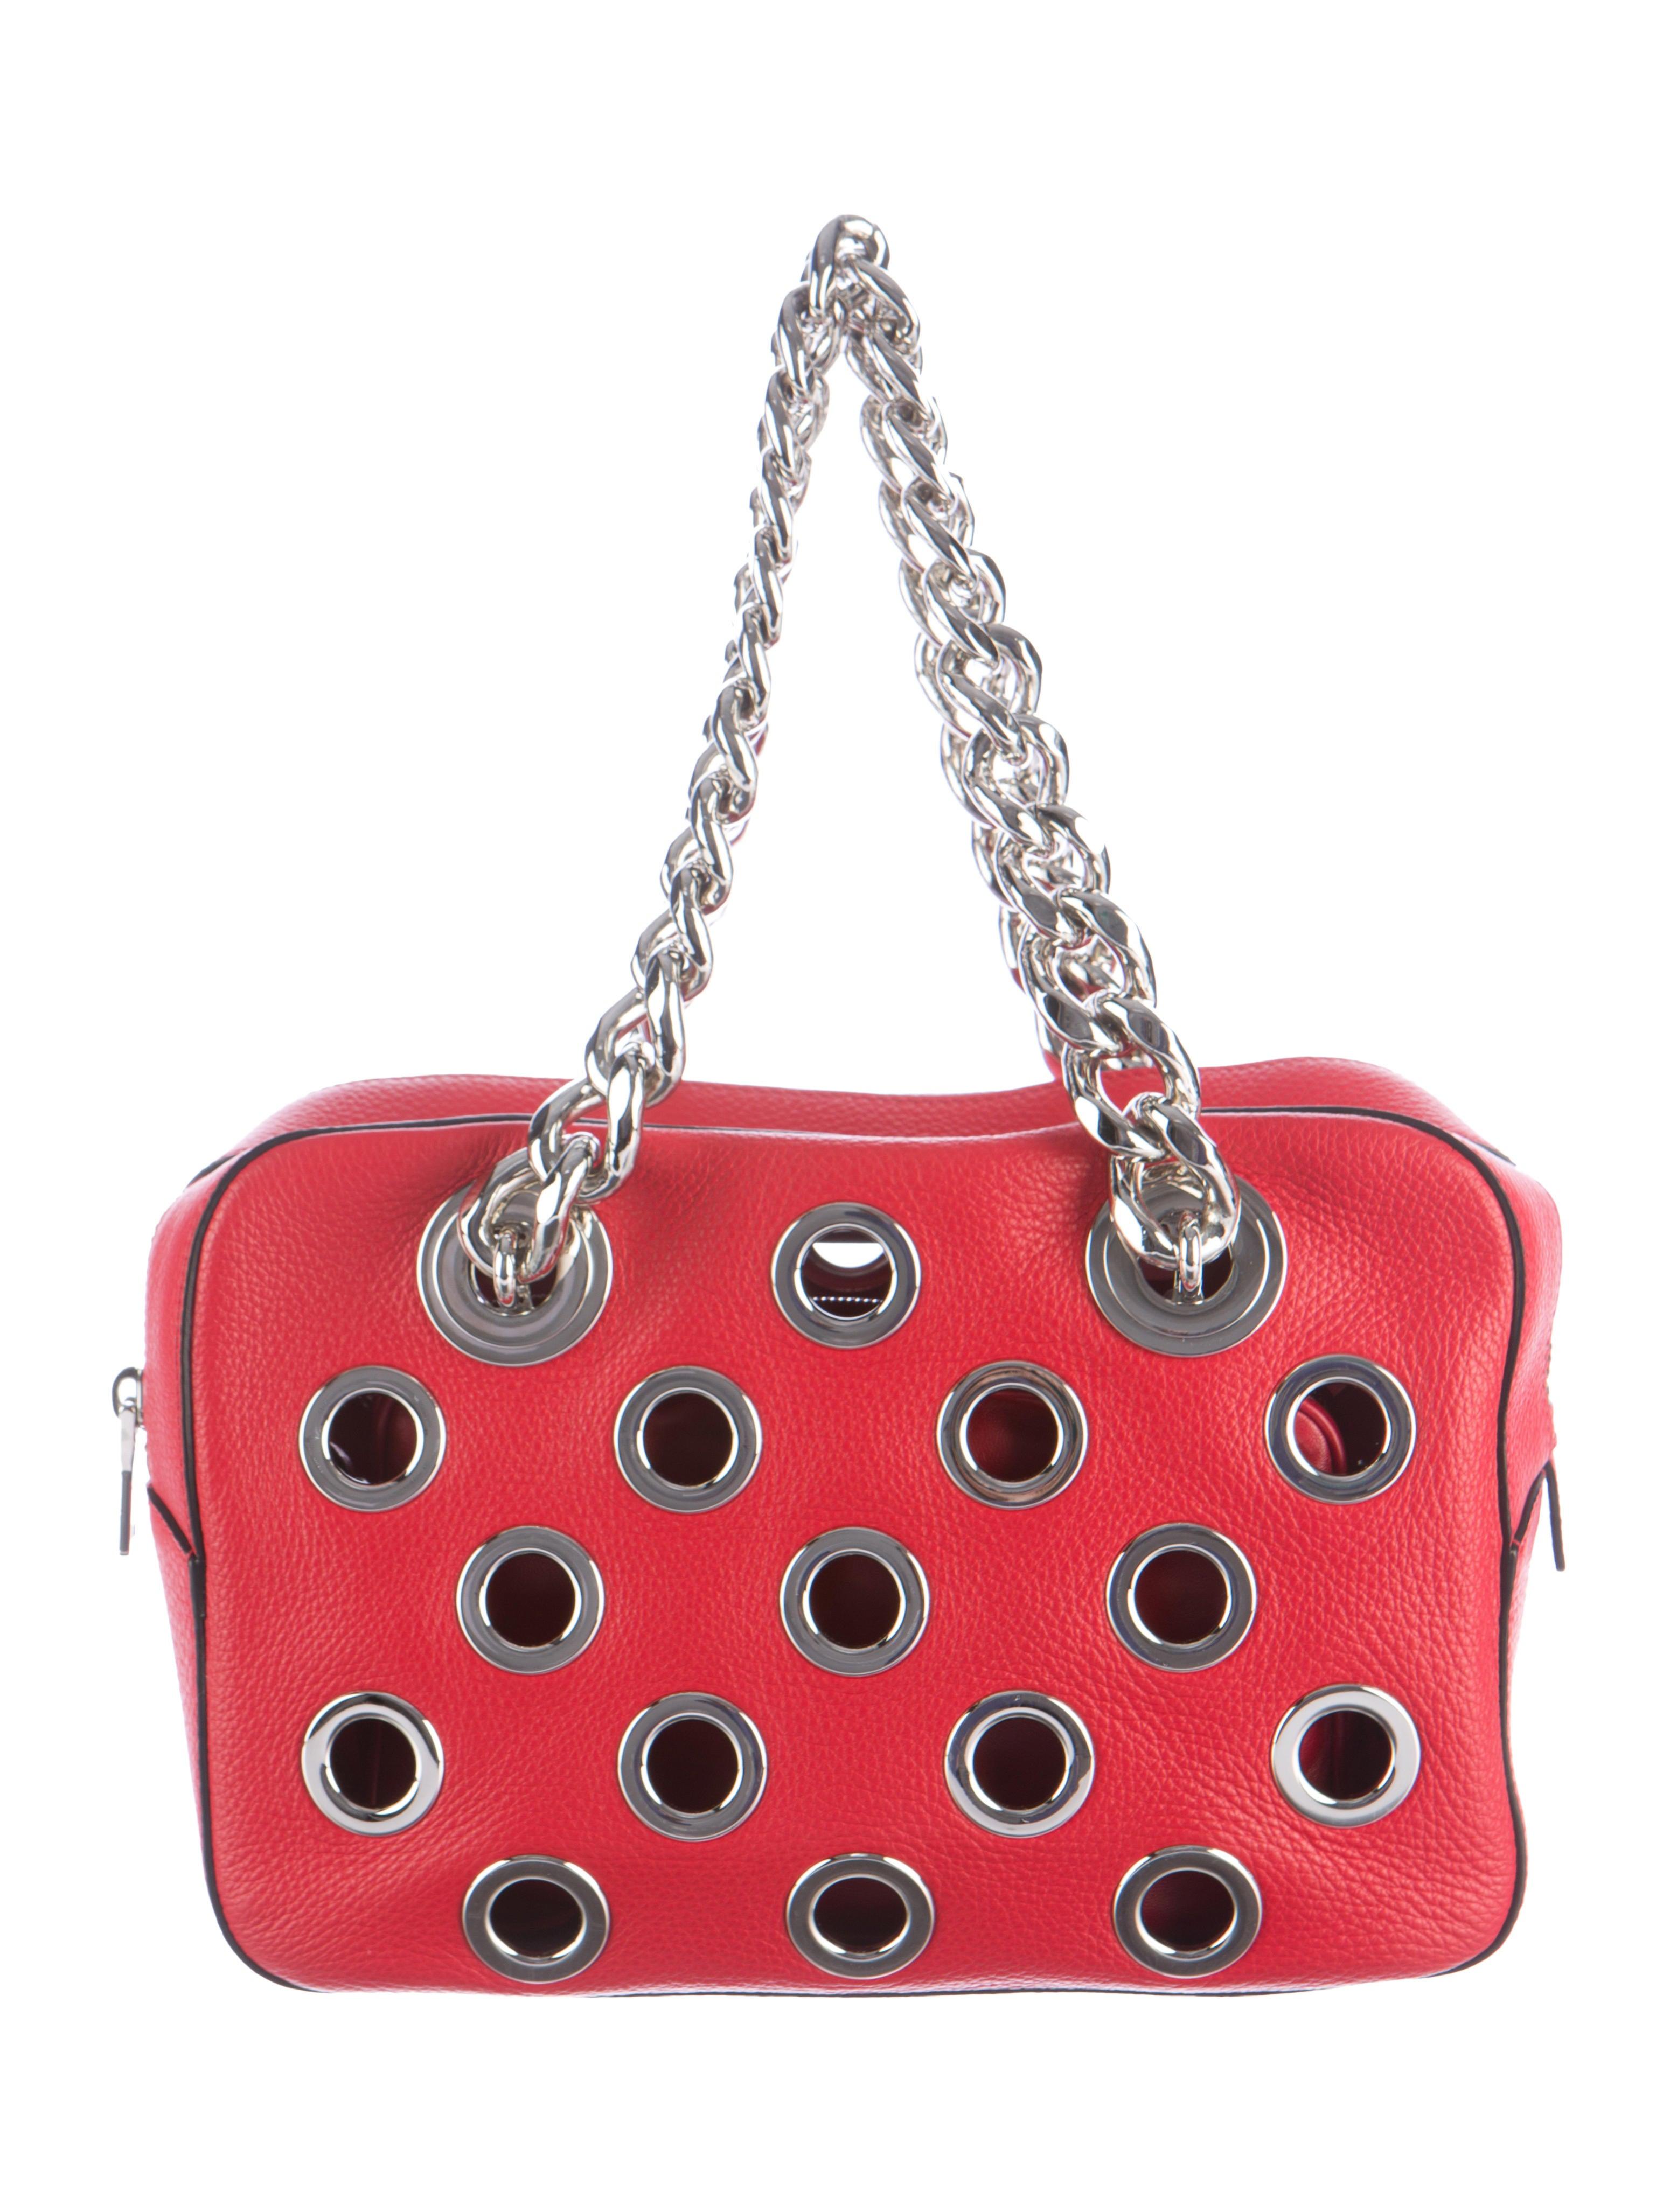 Prada 2016 Vitello Daino Bauletto Bag - Handbags - PRA101880  c14af3feab6eb